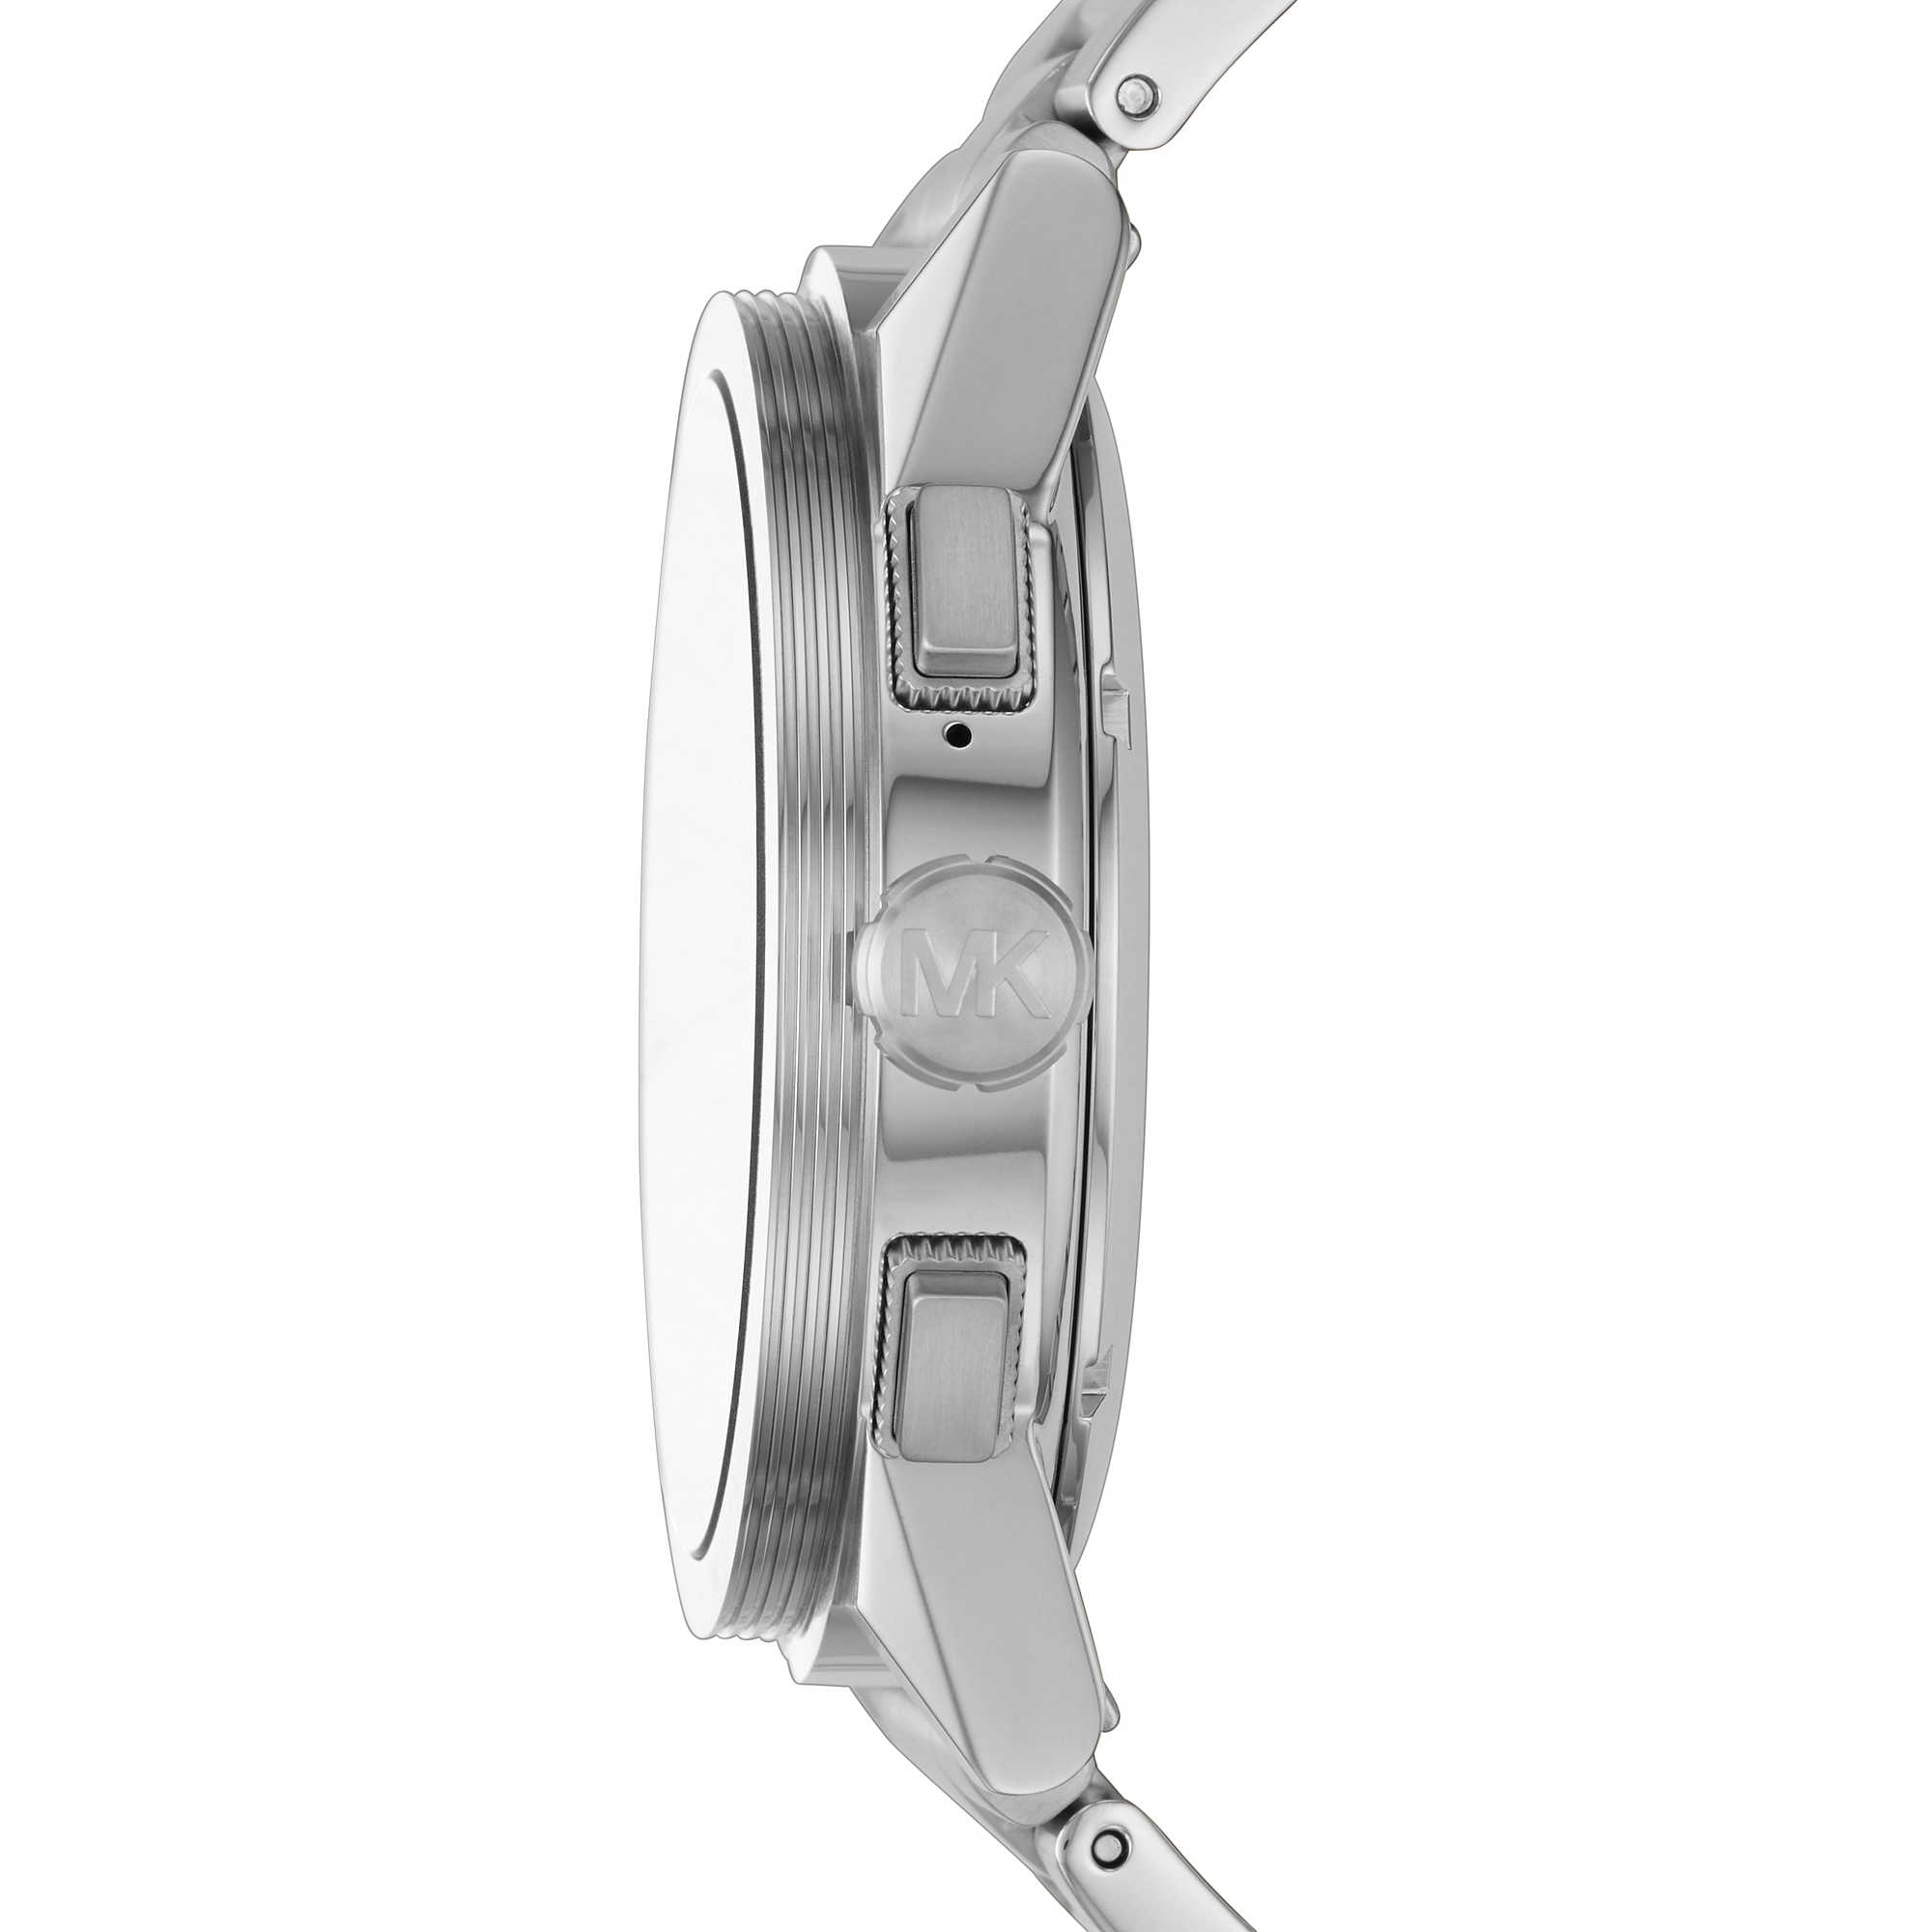 bf28f2989fa19 orologio Smartwatch uomo Michael Kors Grayson MKT5025 Smartwatches ...